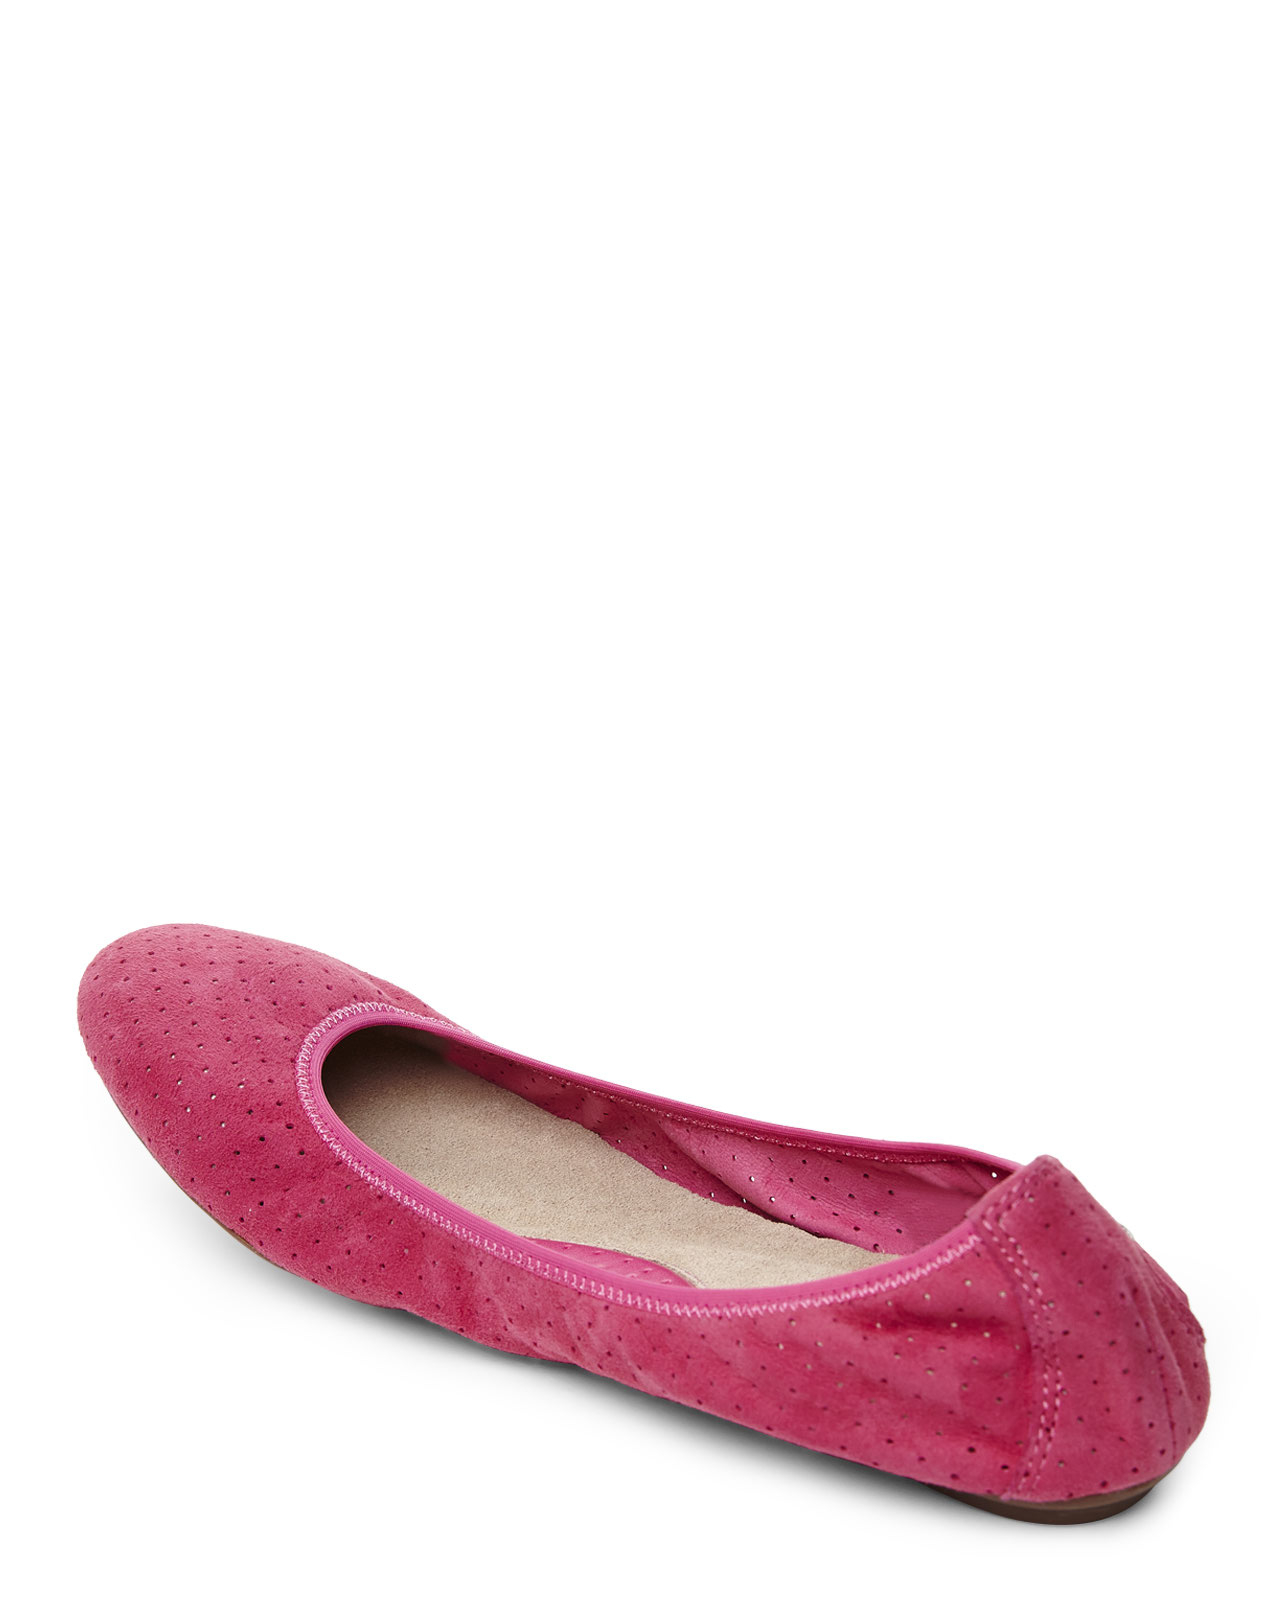 201441c8fce Lyst - Hush Puppies Pink Chaste Ballet Flat in Pink